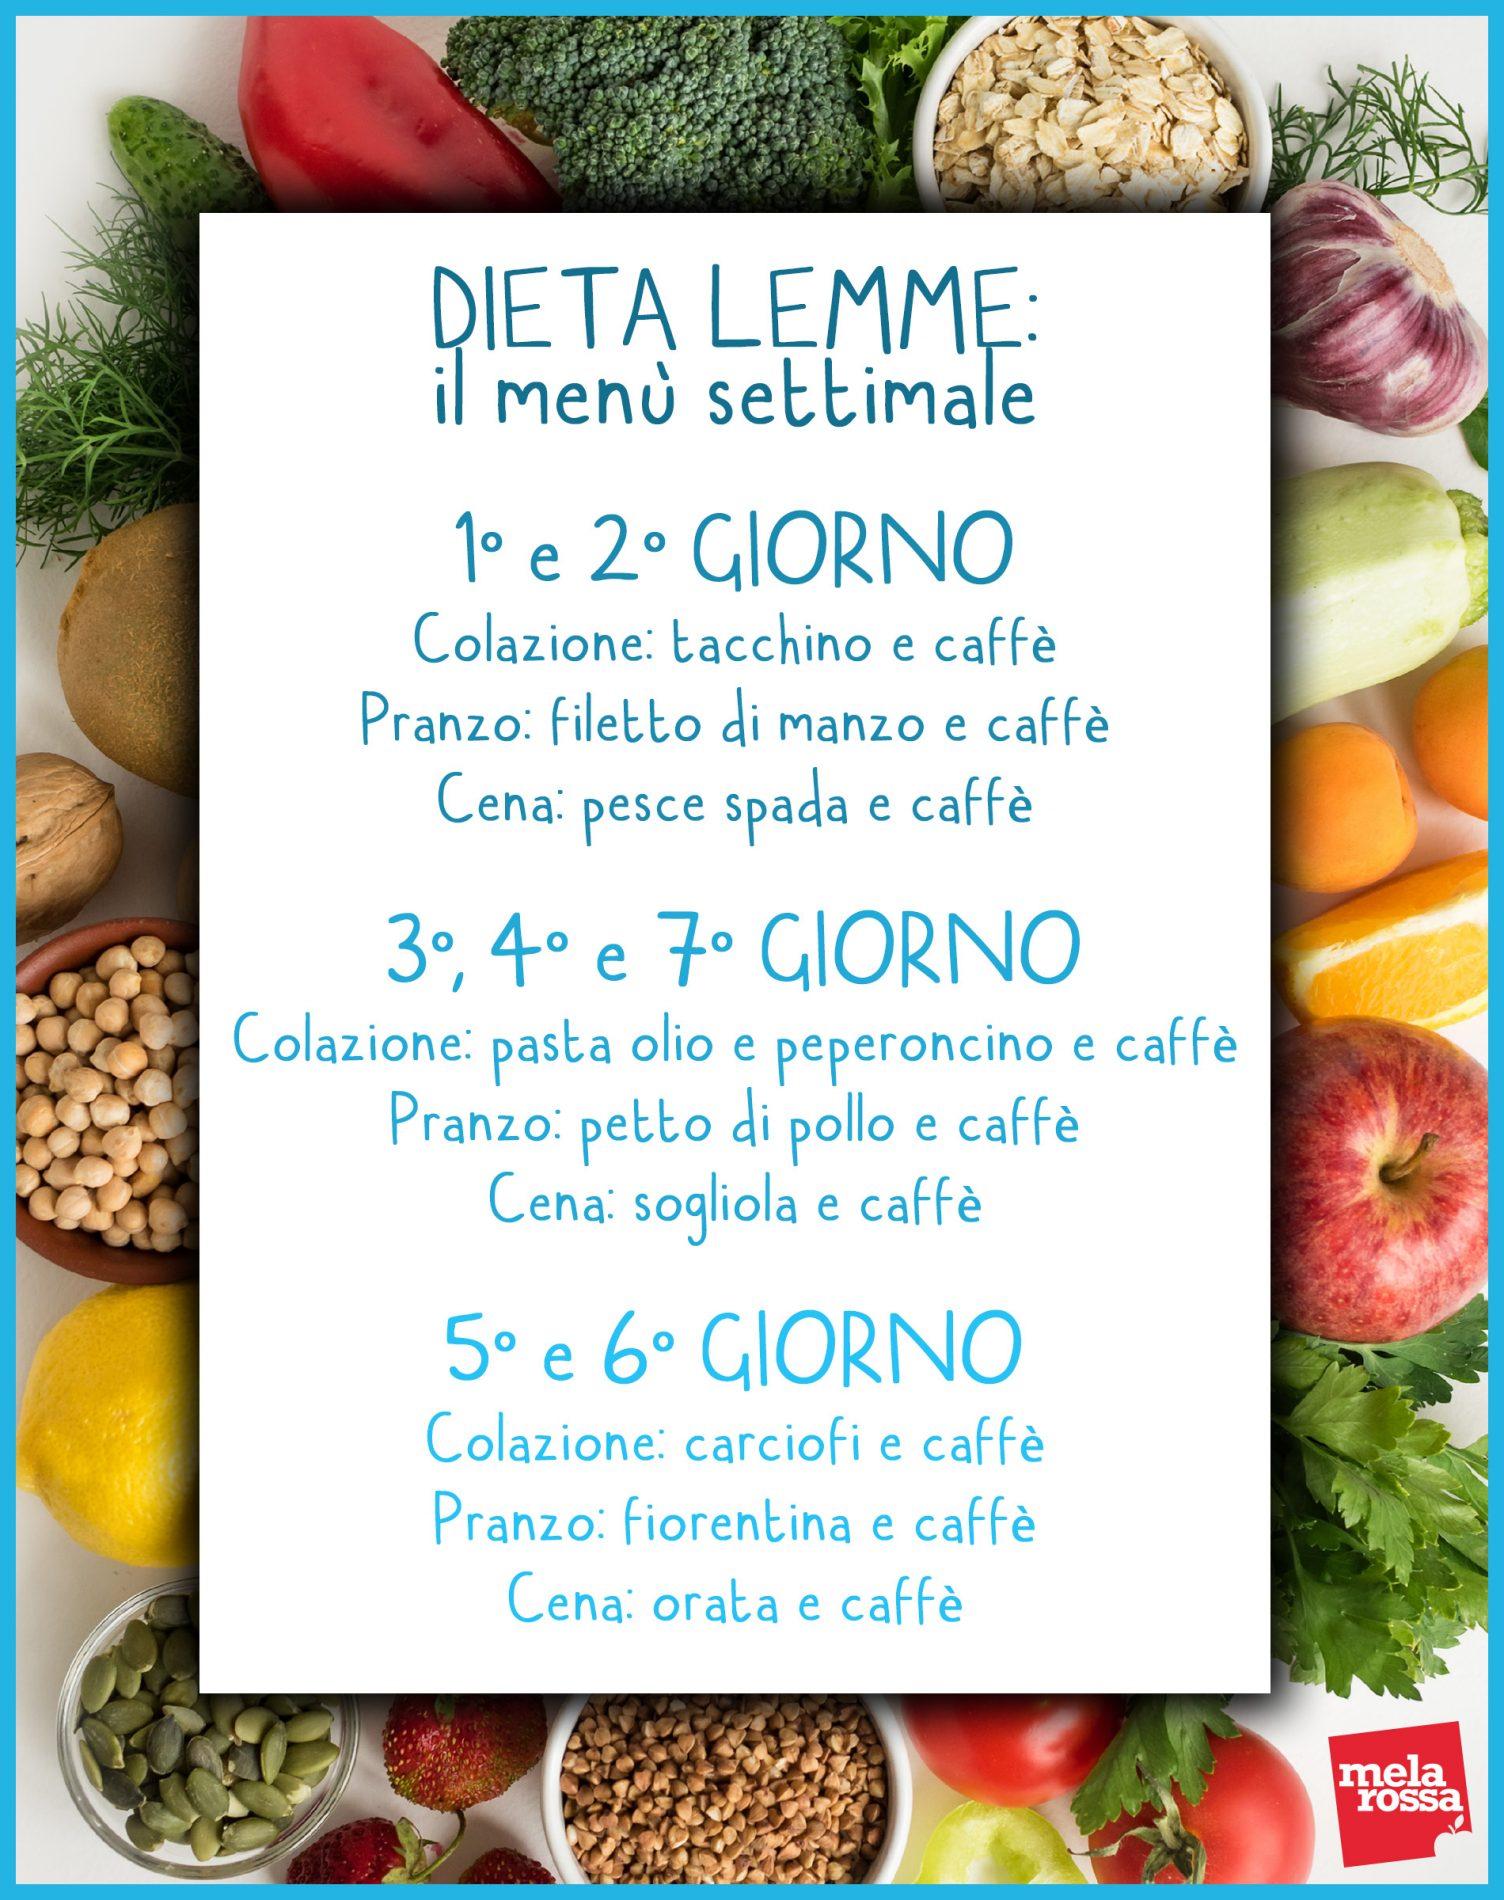 dieta Lemme: esempio di menù settimanale